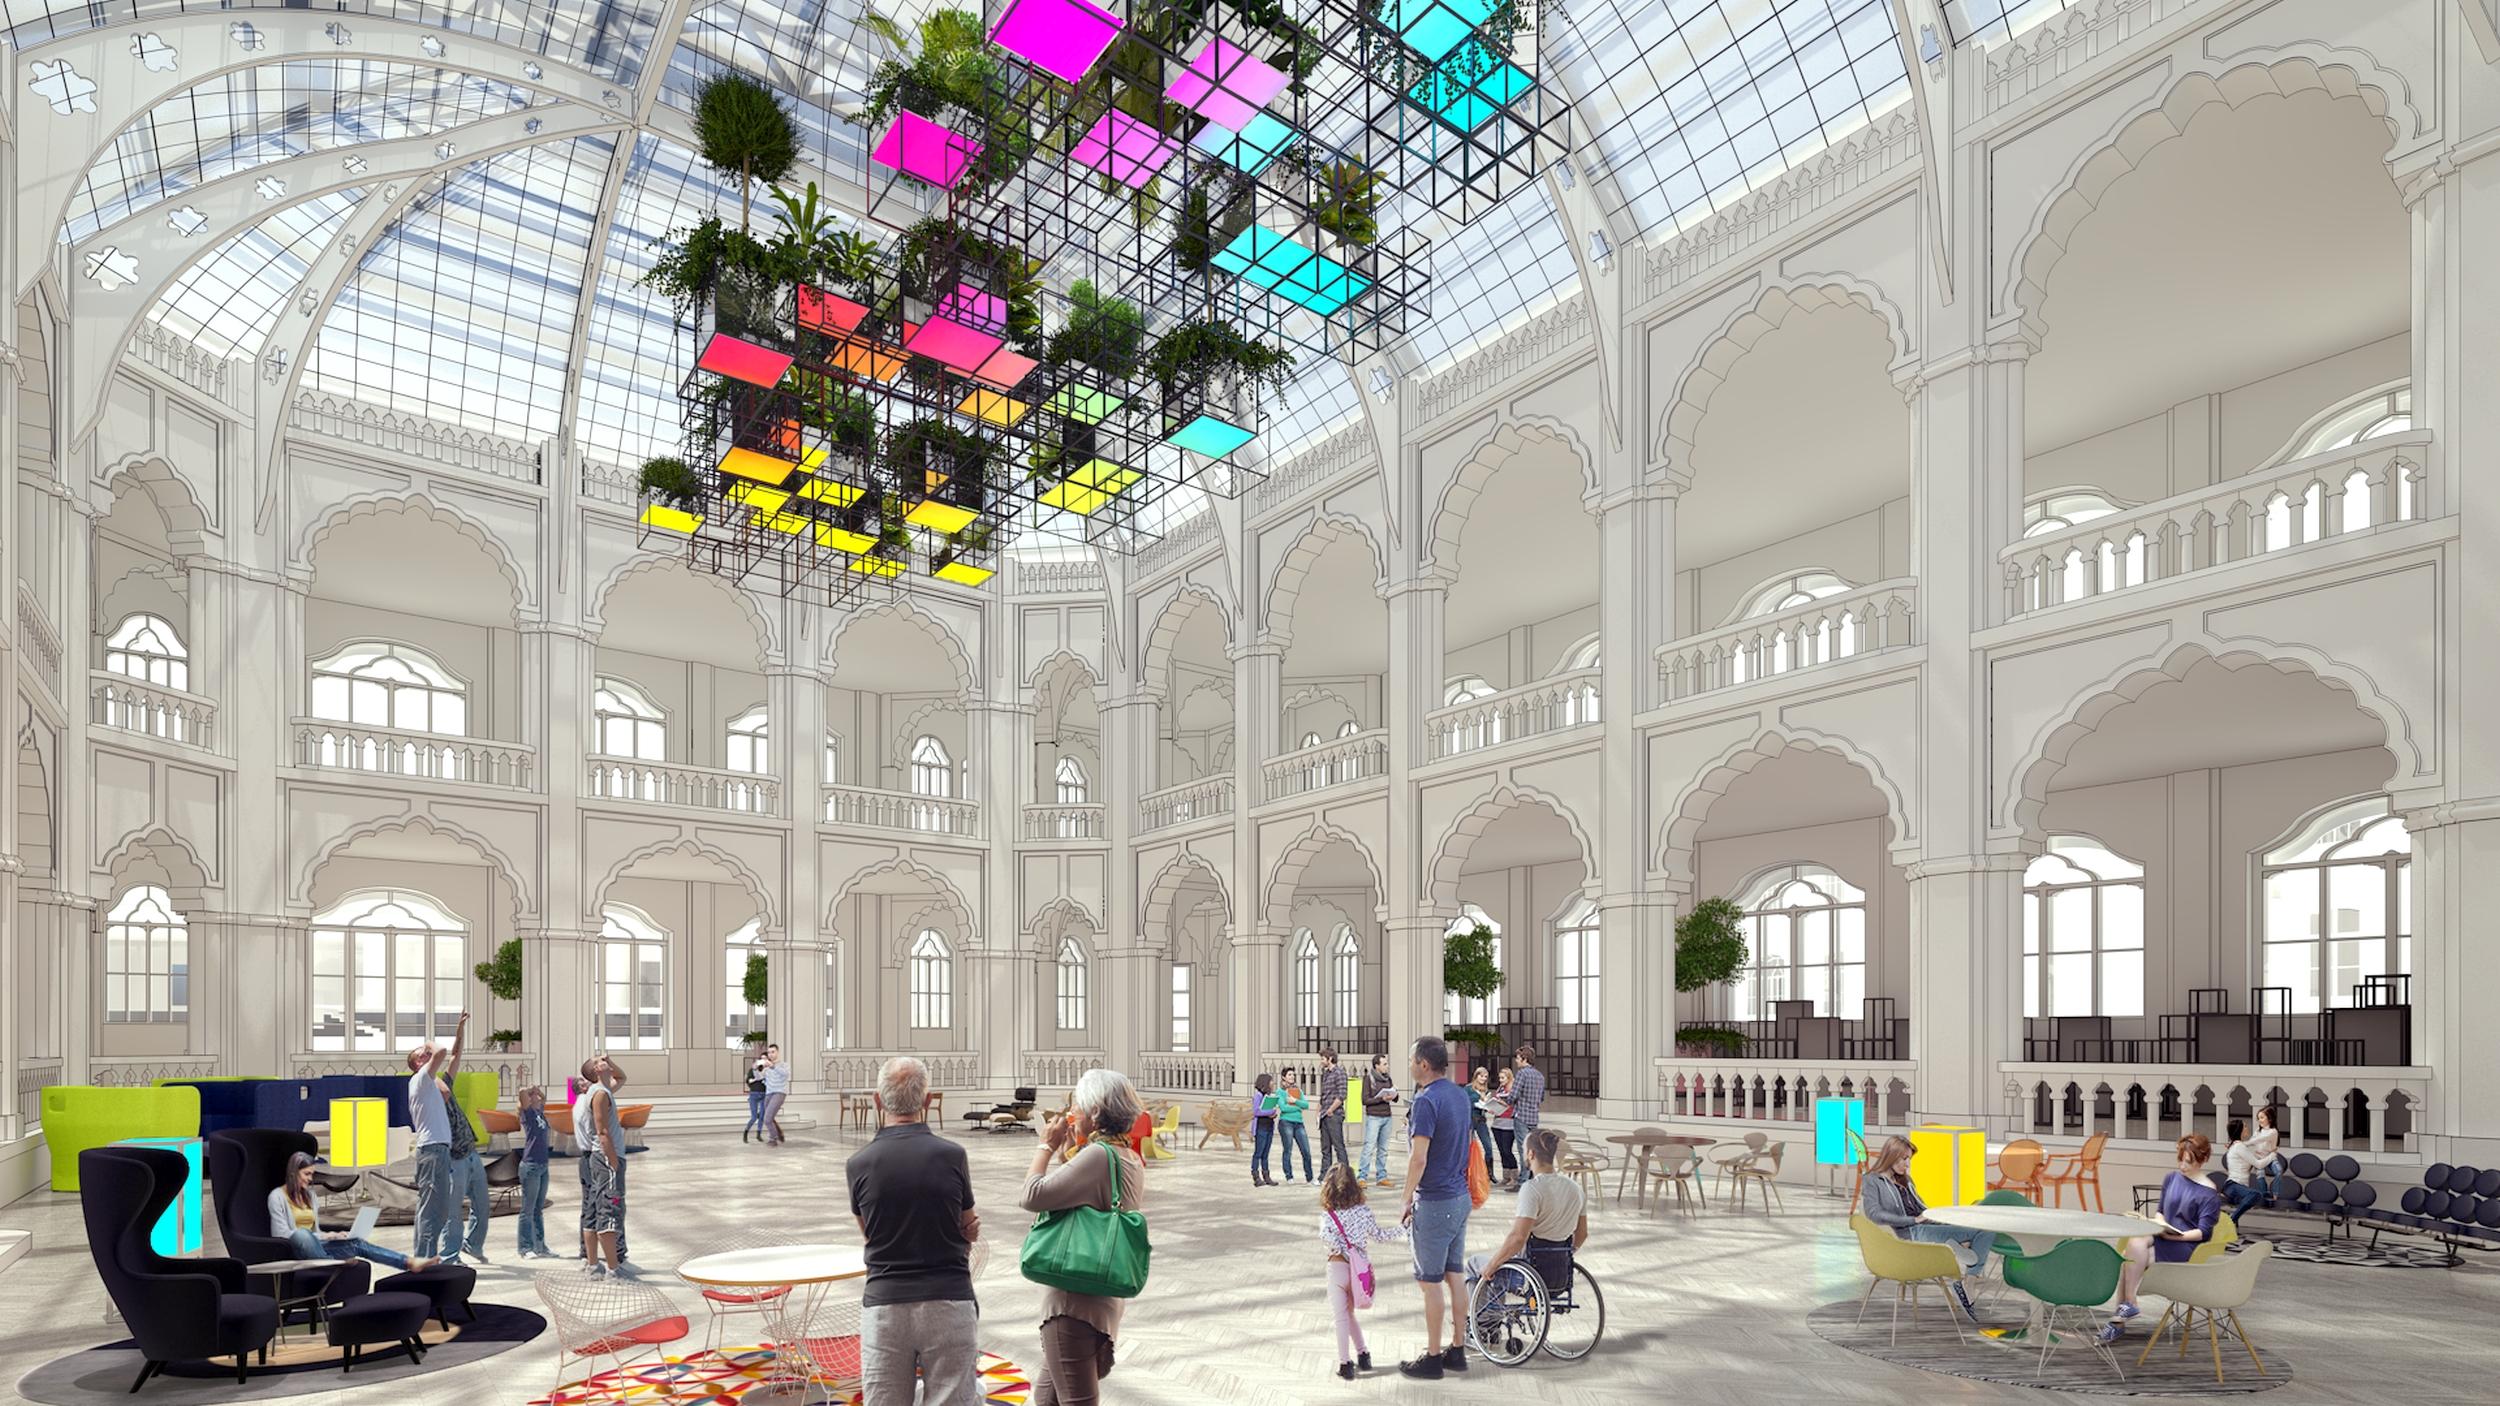 Az Iparművészeti Múzeum belsőépítészete | the inreior design of Museum of Applied Arts, Budapest